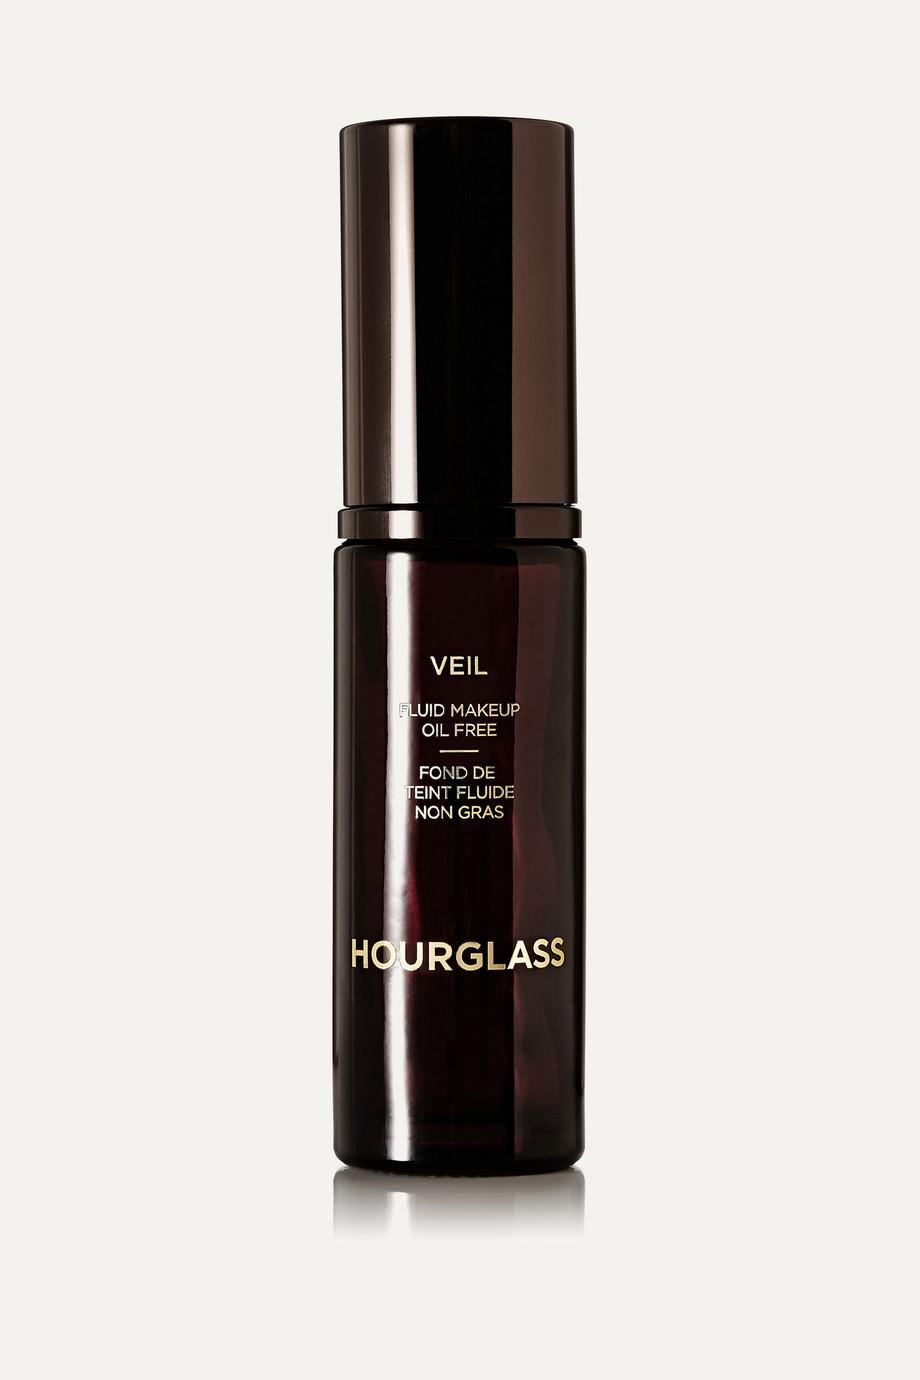 Hourglass Veil Fluid MakeUp No 1.5 - Nude, 30ml